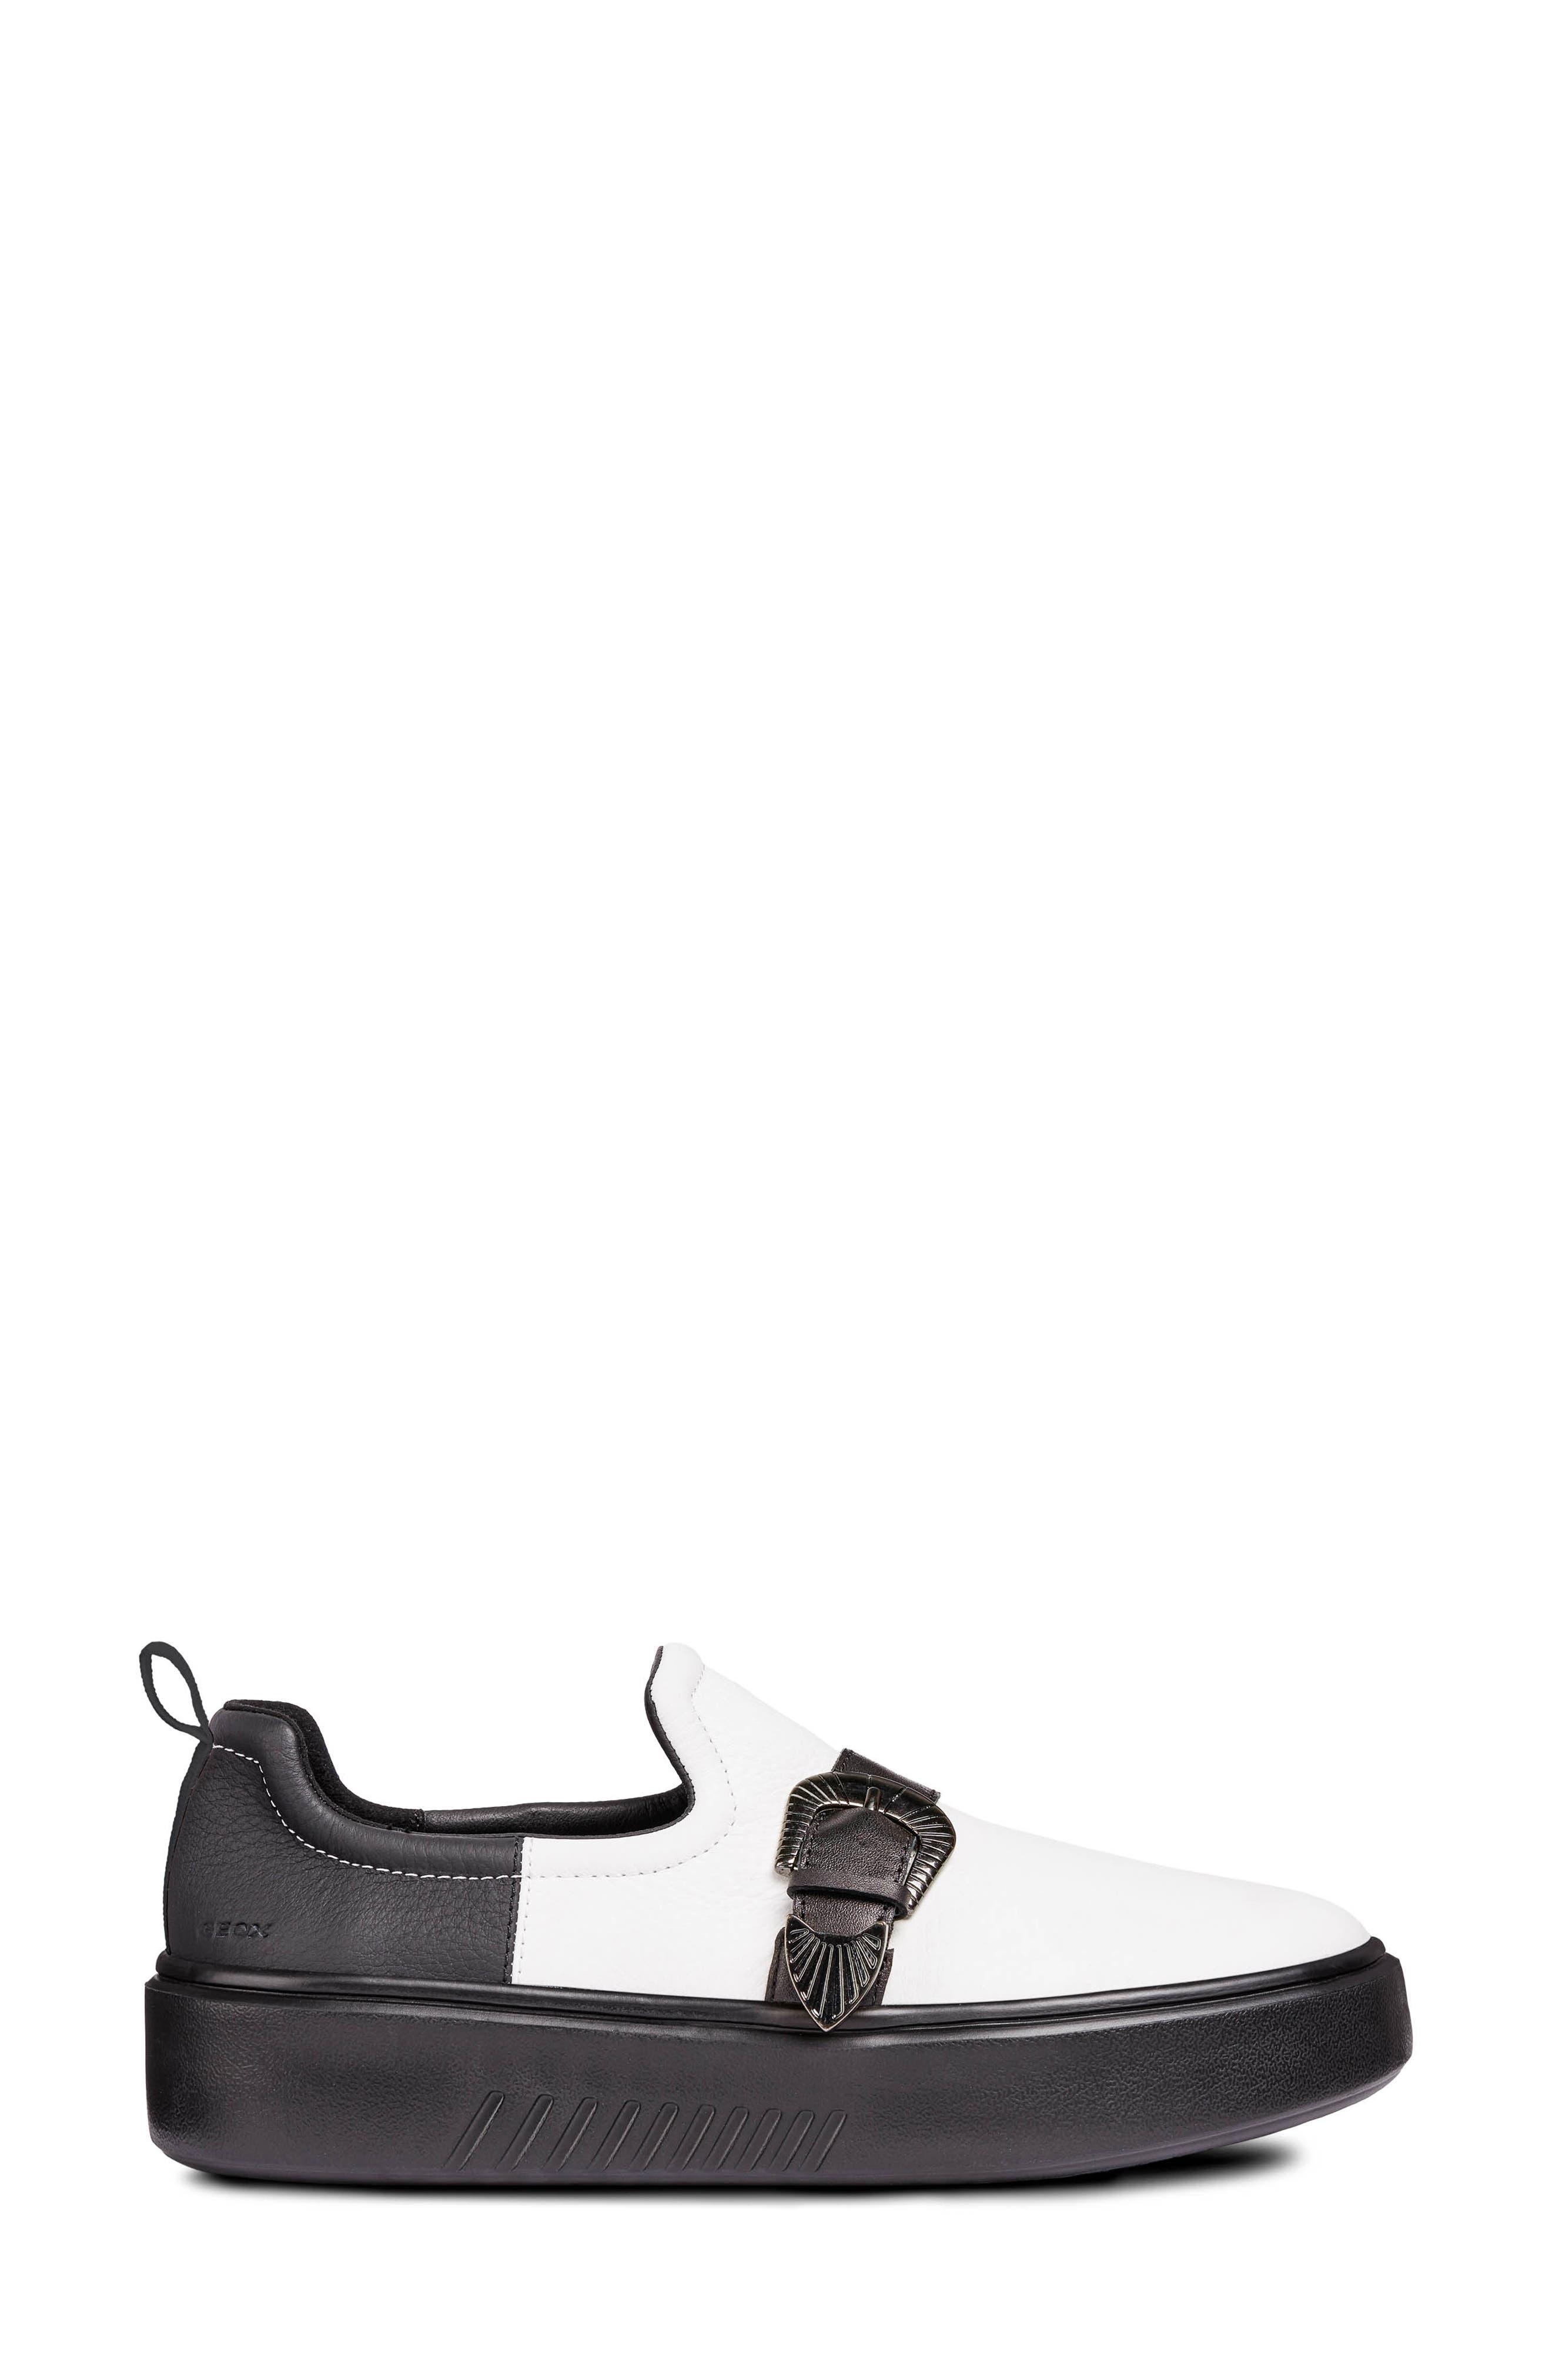 Nhenbus Platform Sneaker,                             Alternate thumbnail 3, color,                             WHITE/ BLACK LEATHER